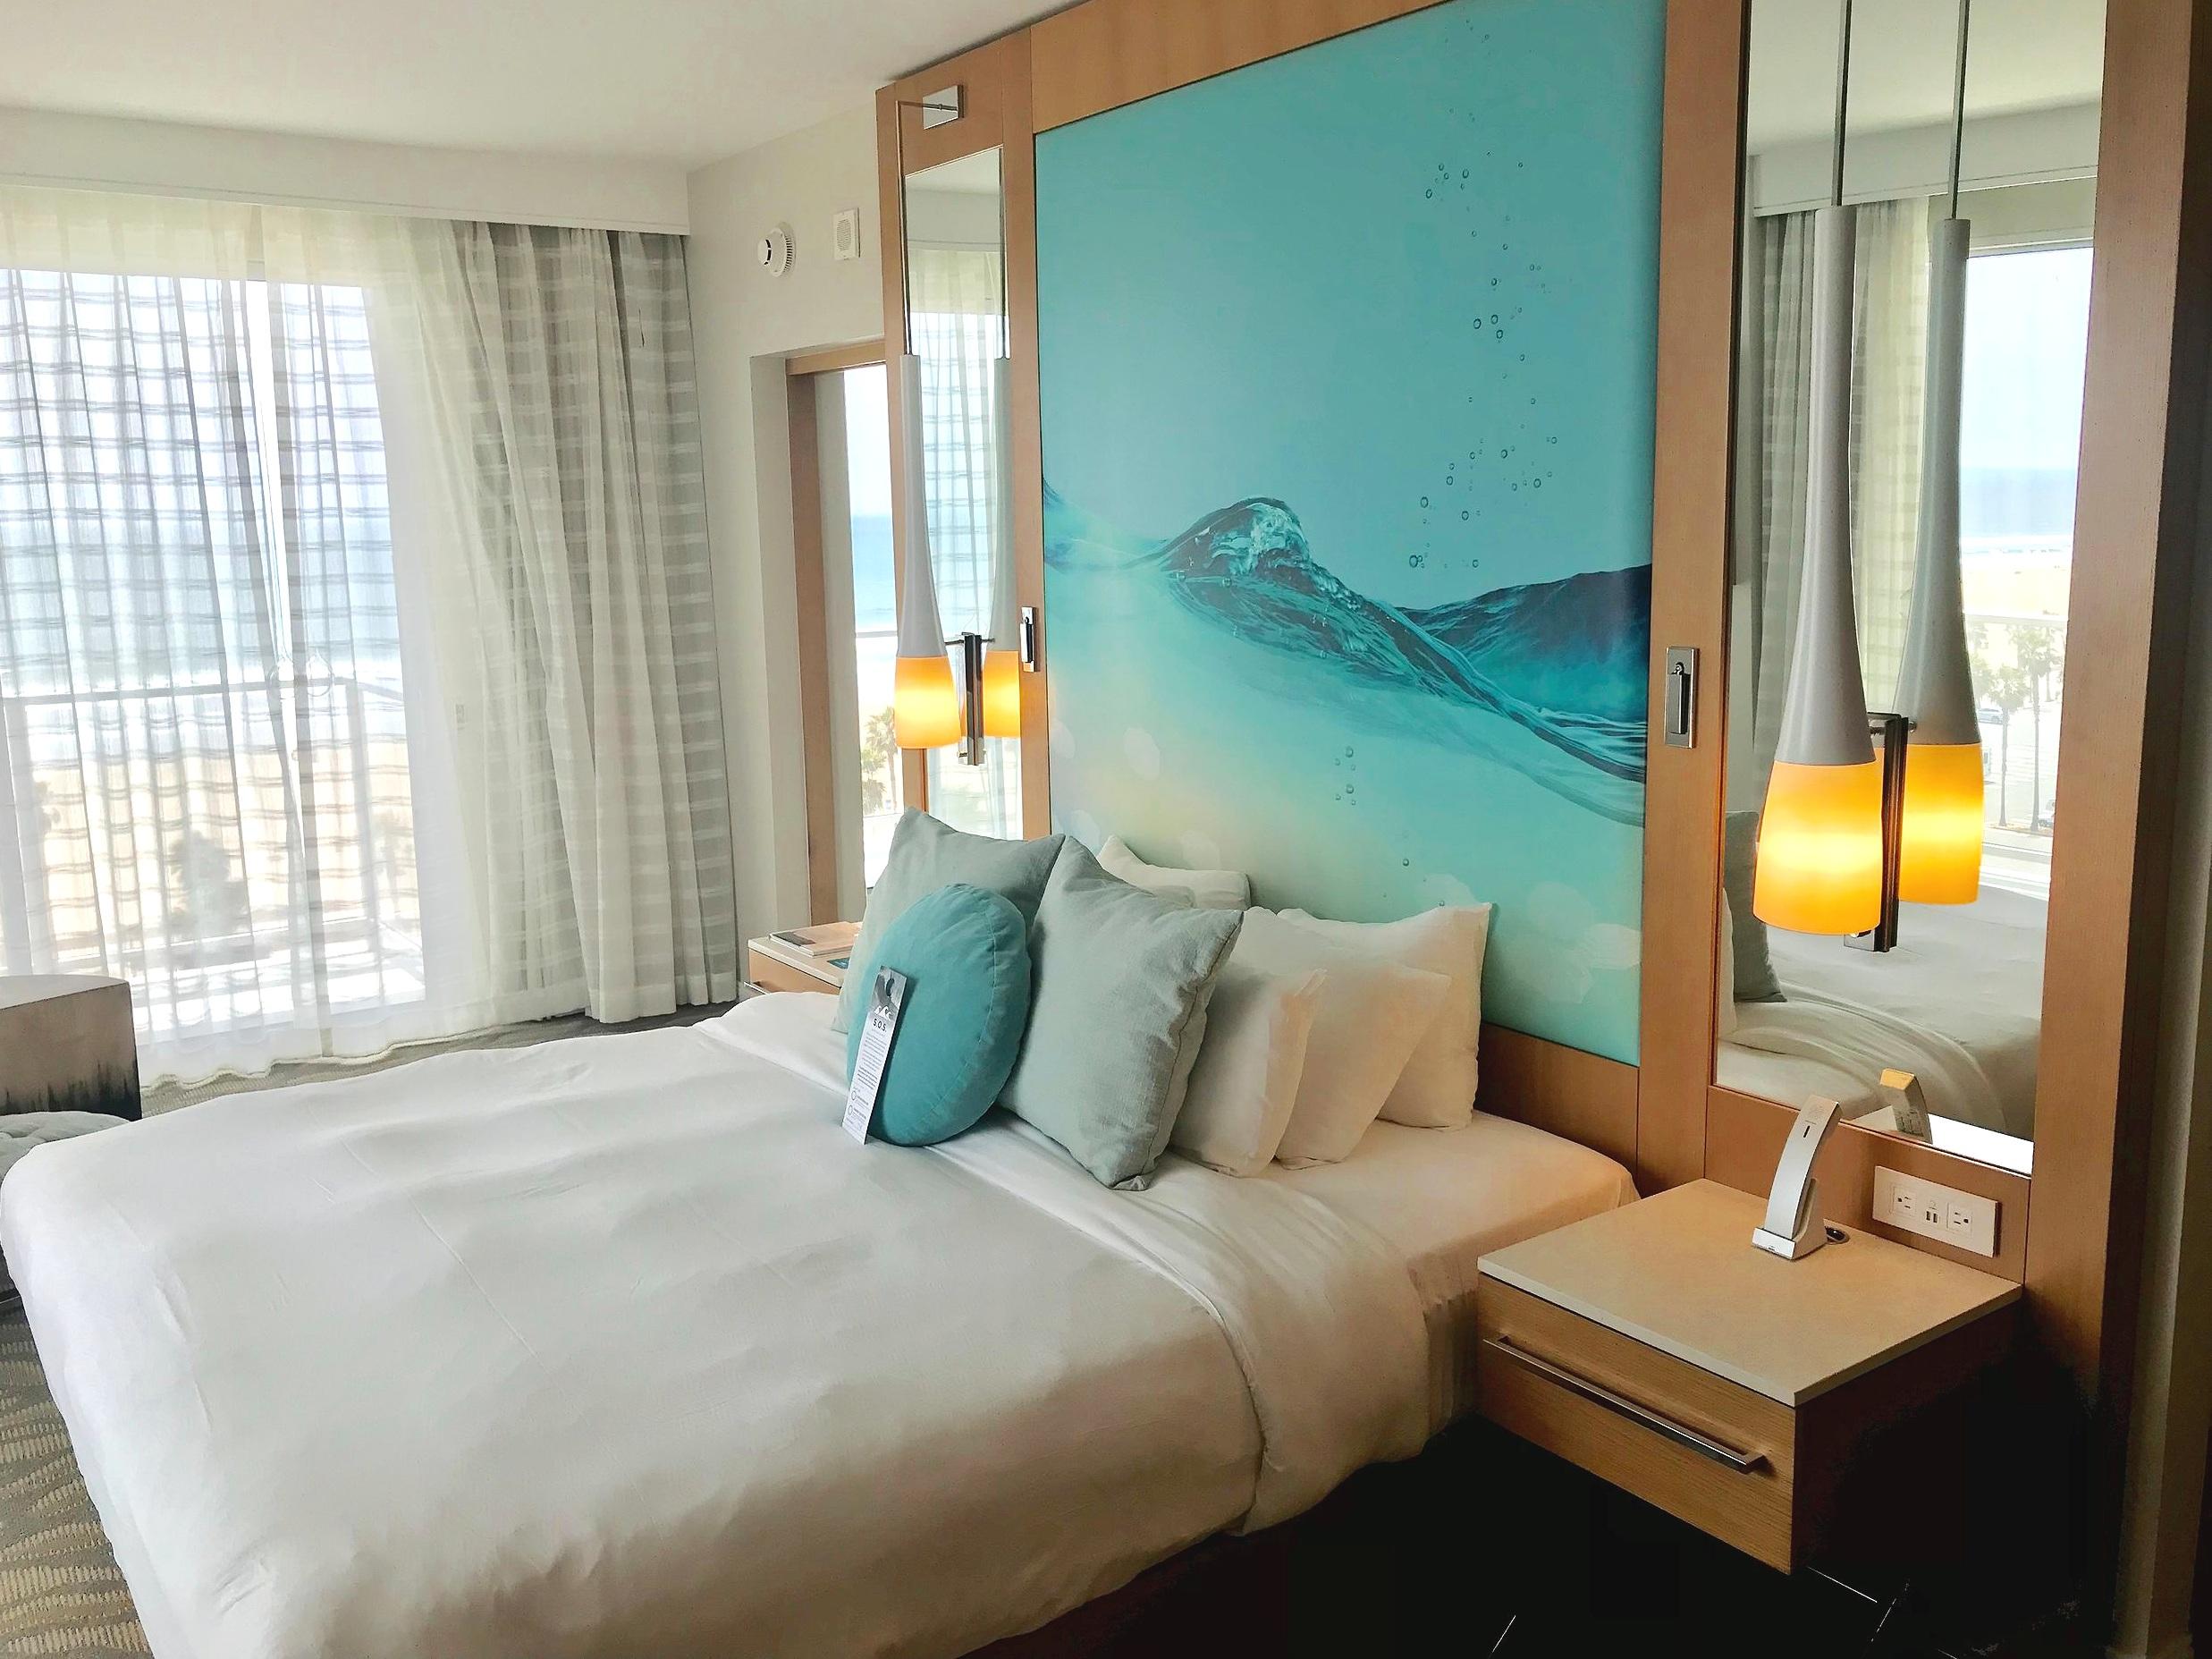 250 - Guest Rooms with ocean views @PaseaHotelandSpa